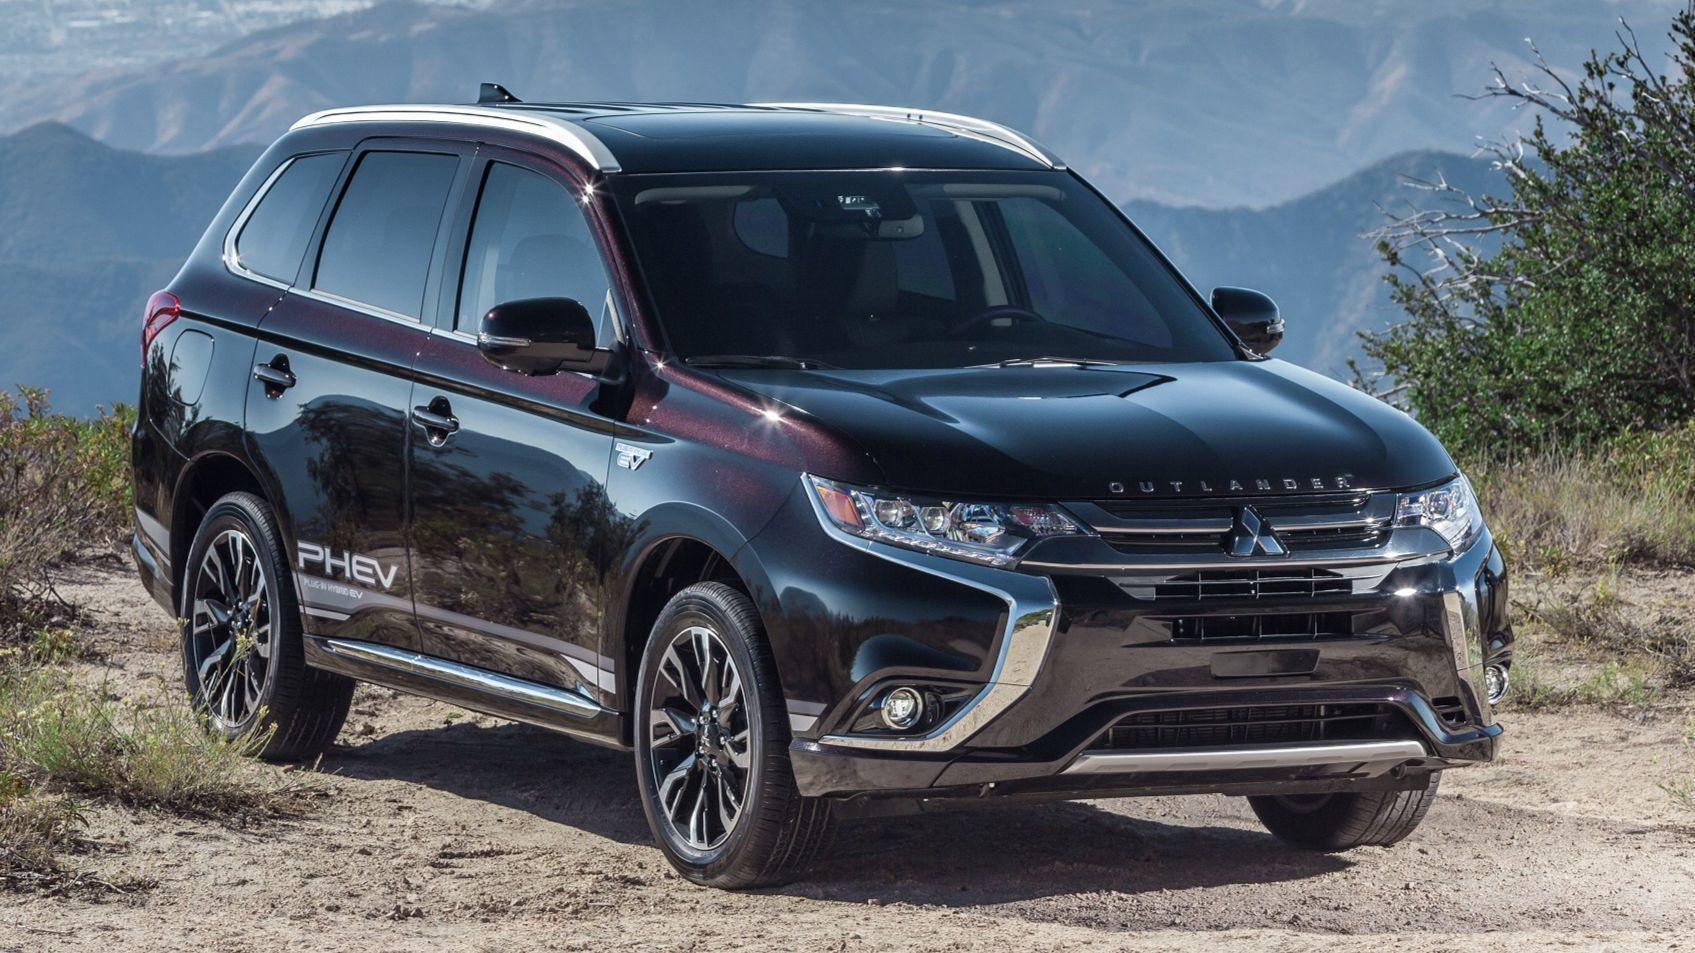 2018 Mitsubishi Outlander Phev A Proactive Power Source